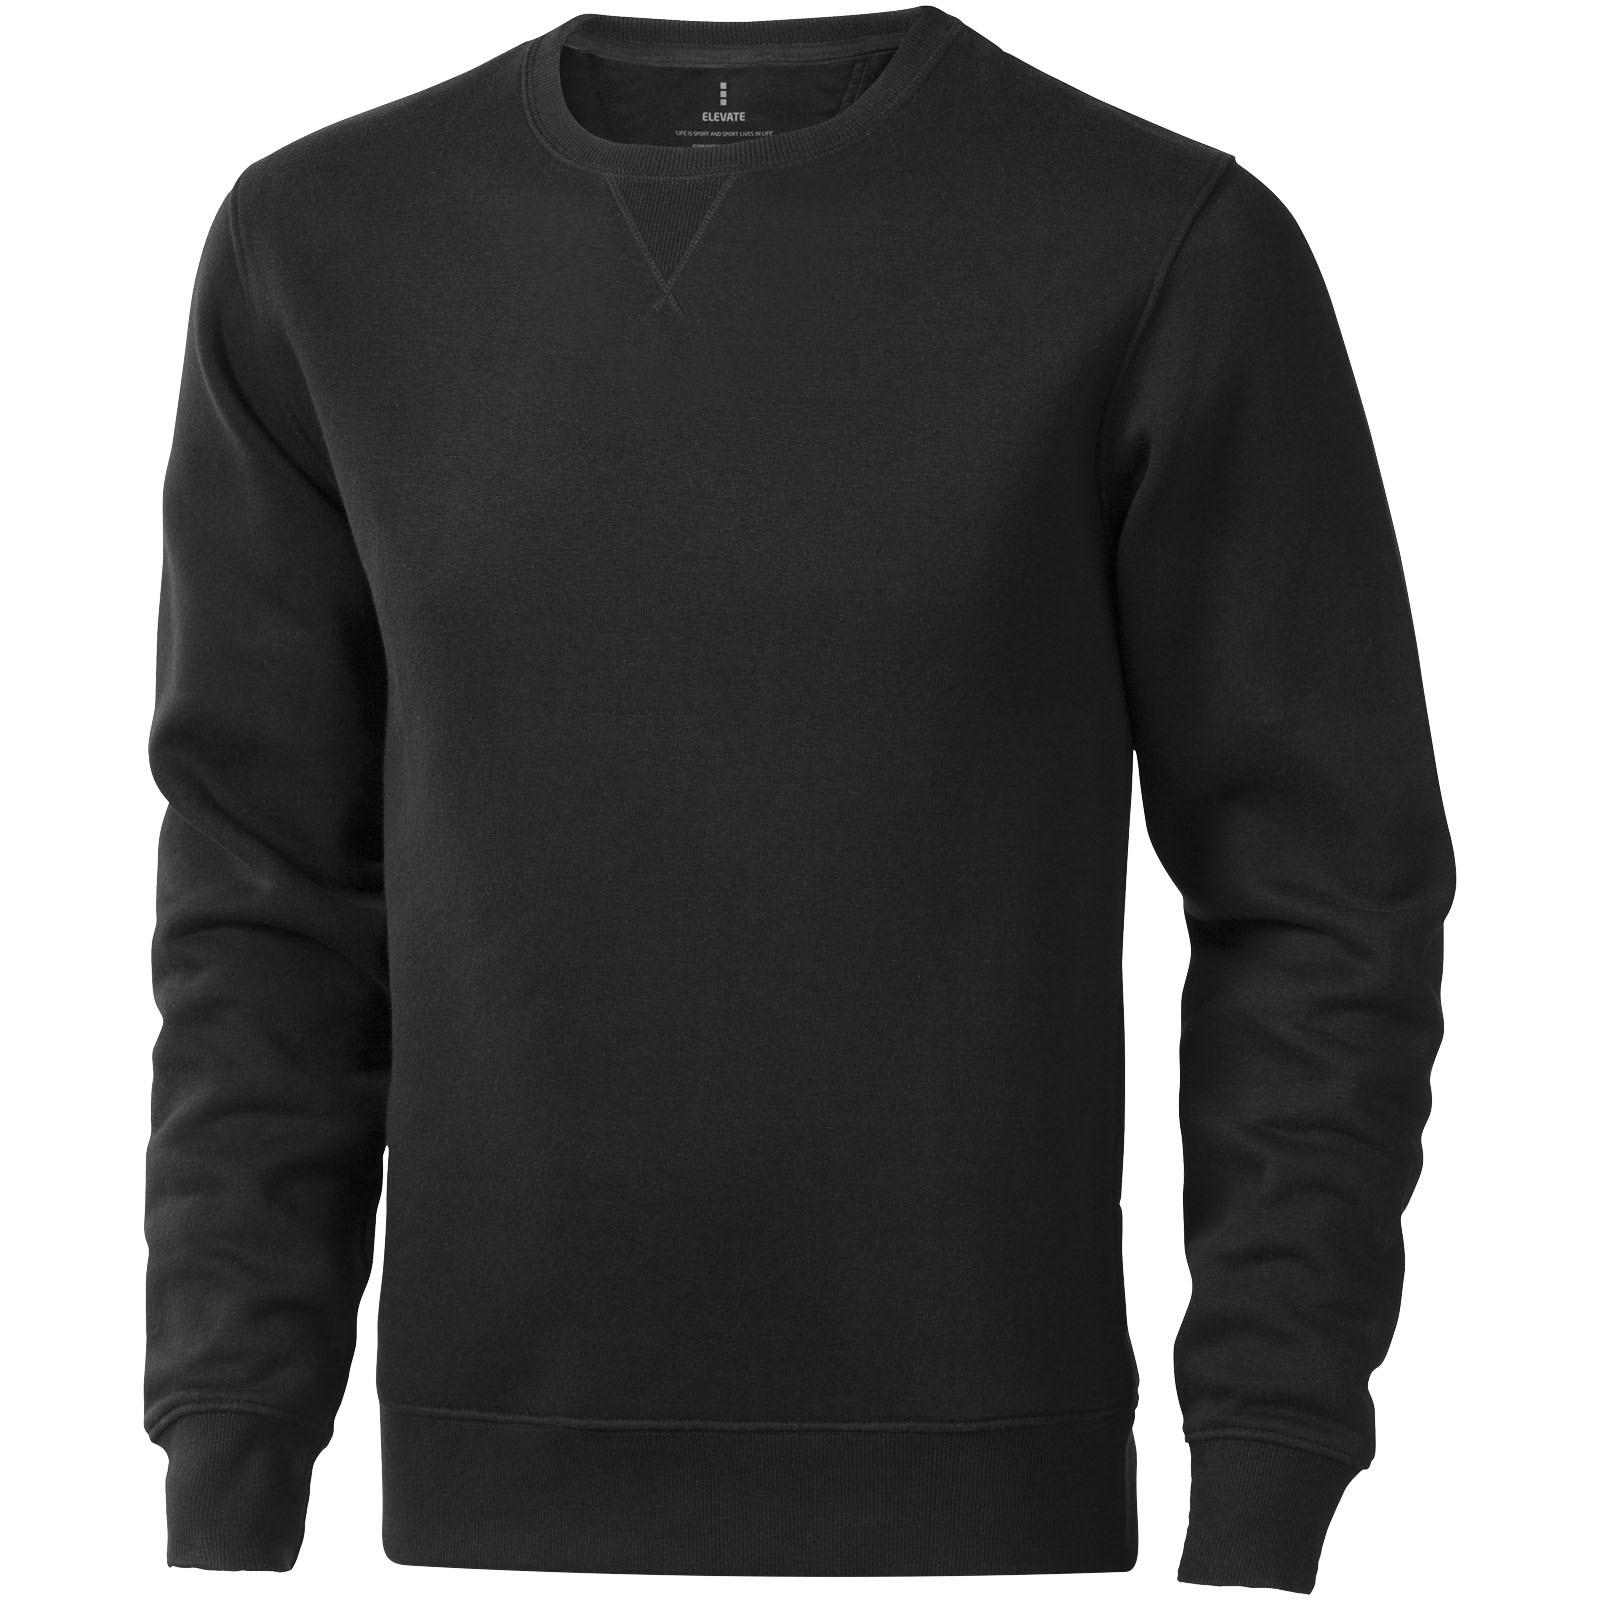 Surrey crew Sweater - Anthracite / XL